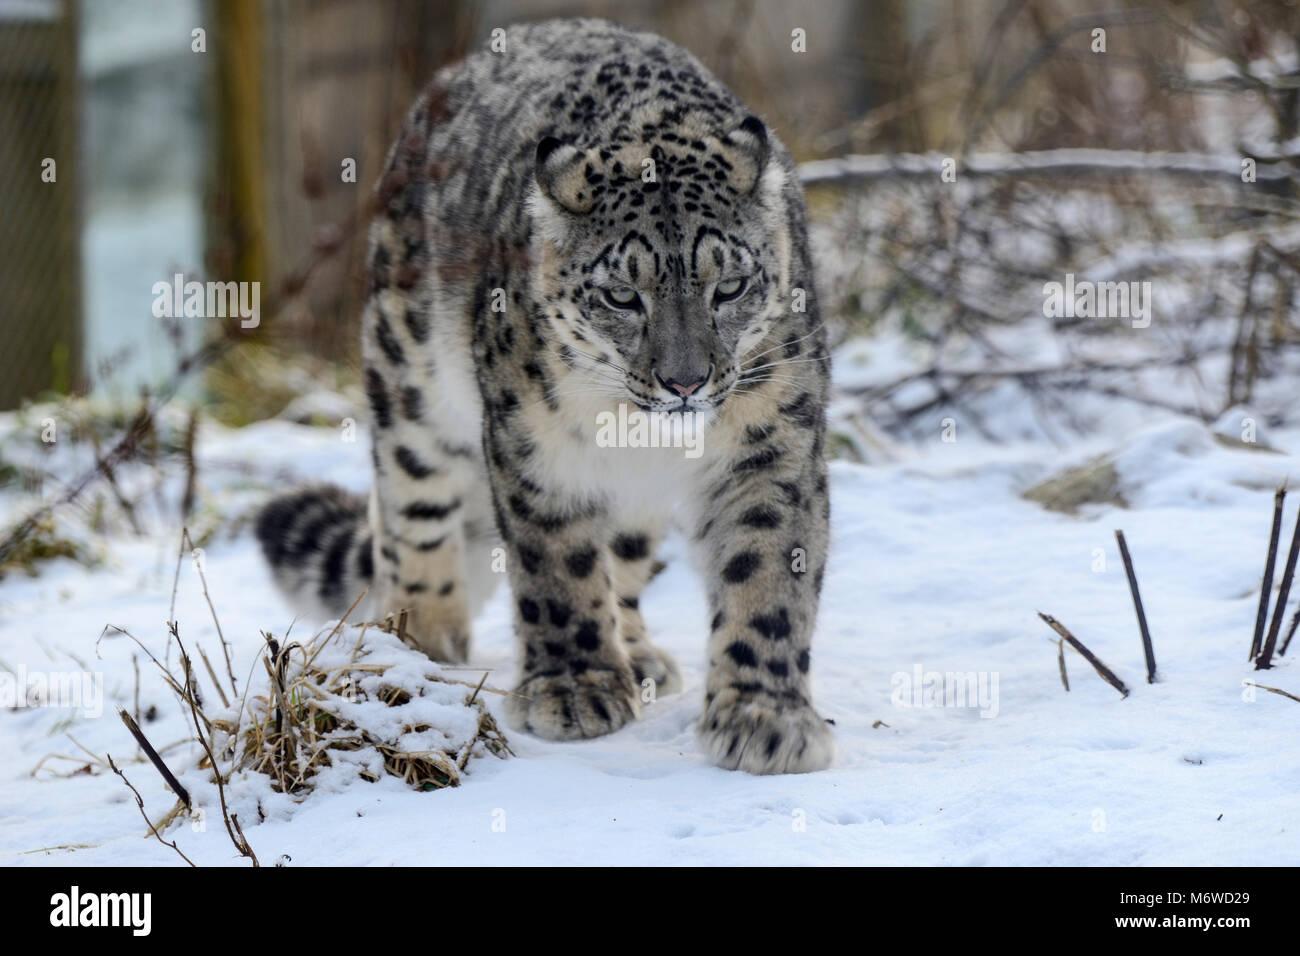 Captive snow leopard (Panthera uncia) at Highland Wildlife Park, Kincraig, Kingussie, Scotland, UK - Stock Image